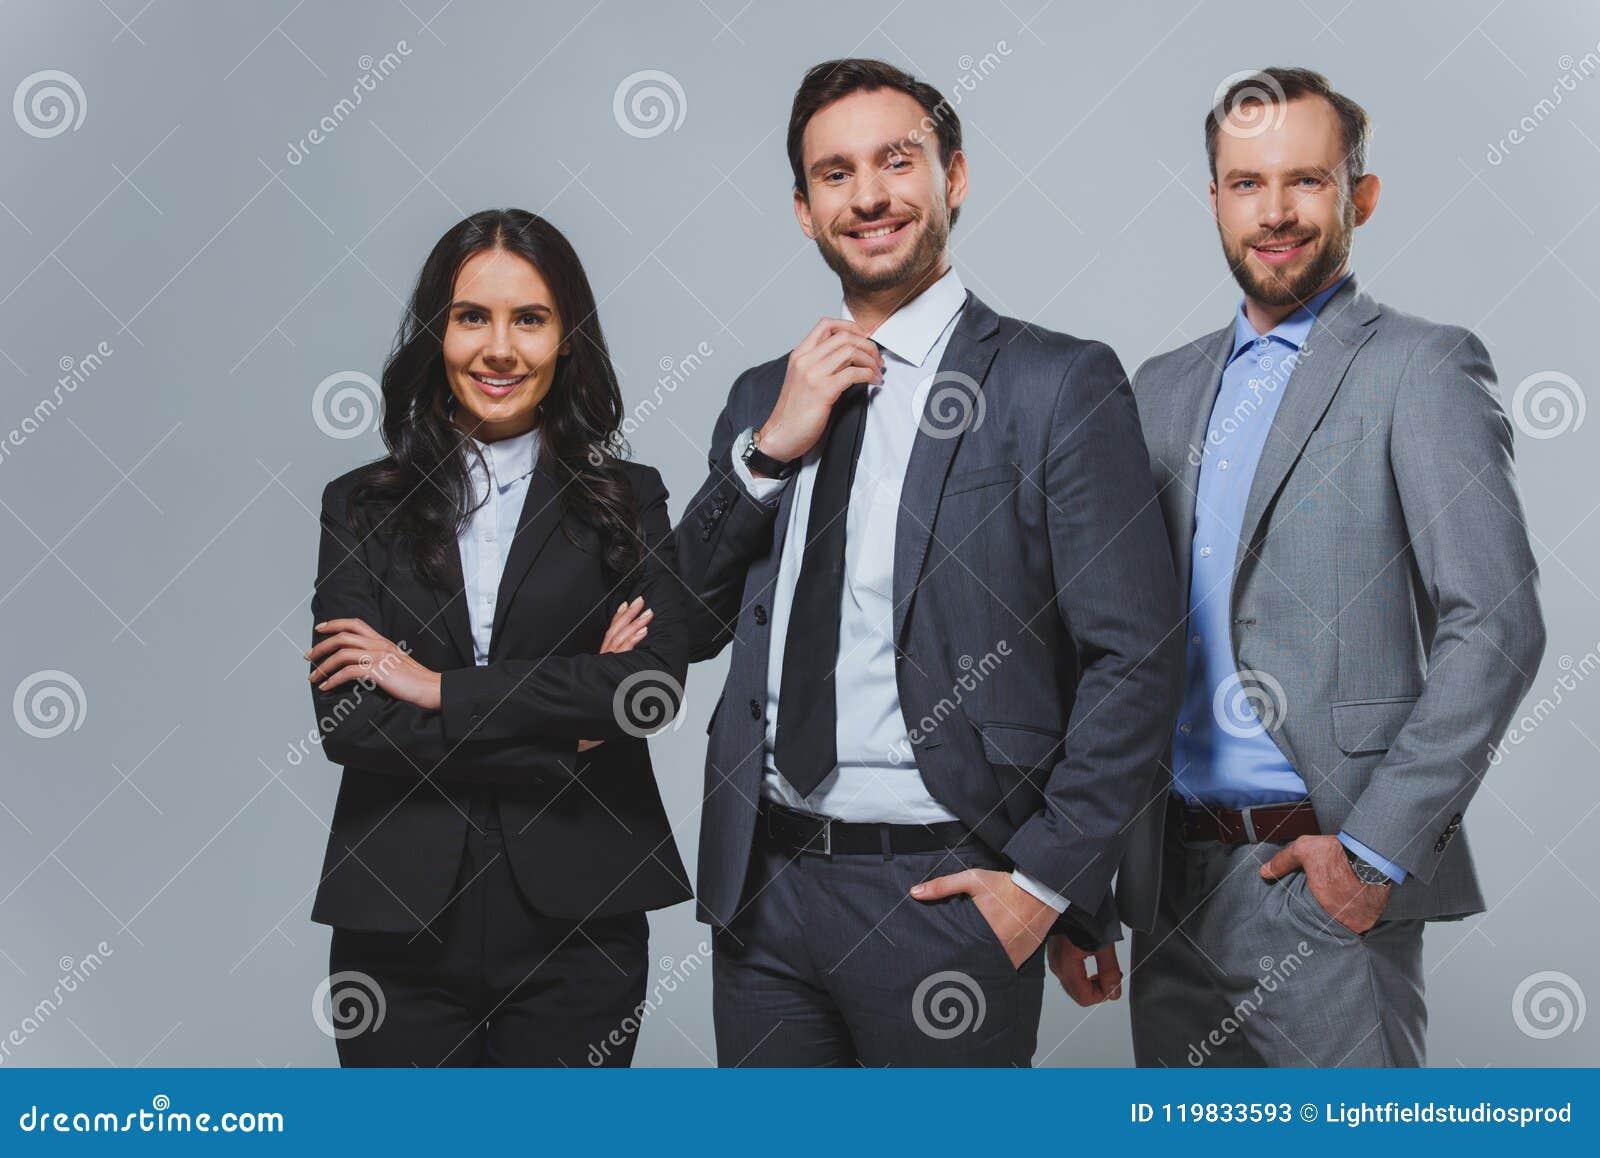 Glimlachende bedrijfscollega s die camera bekijken